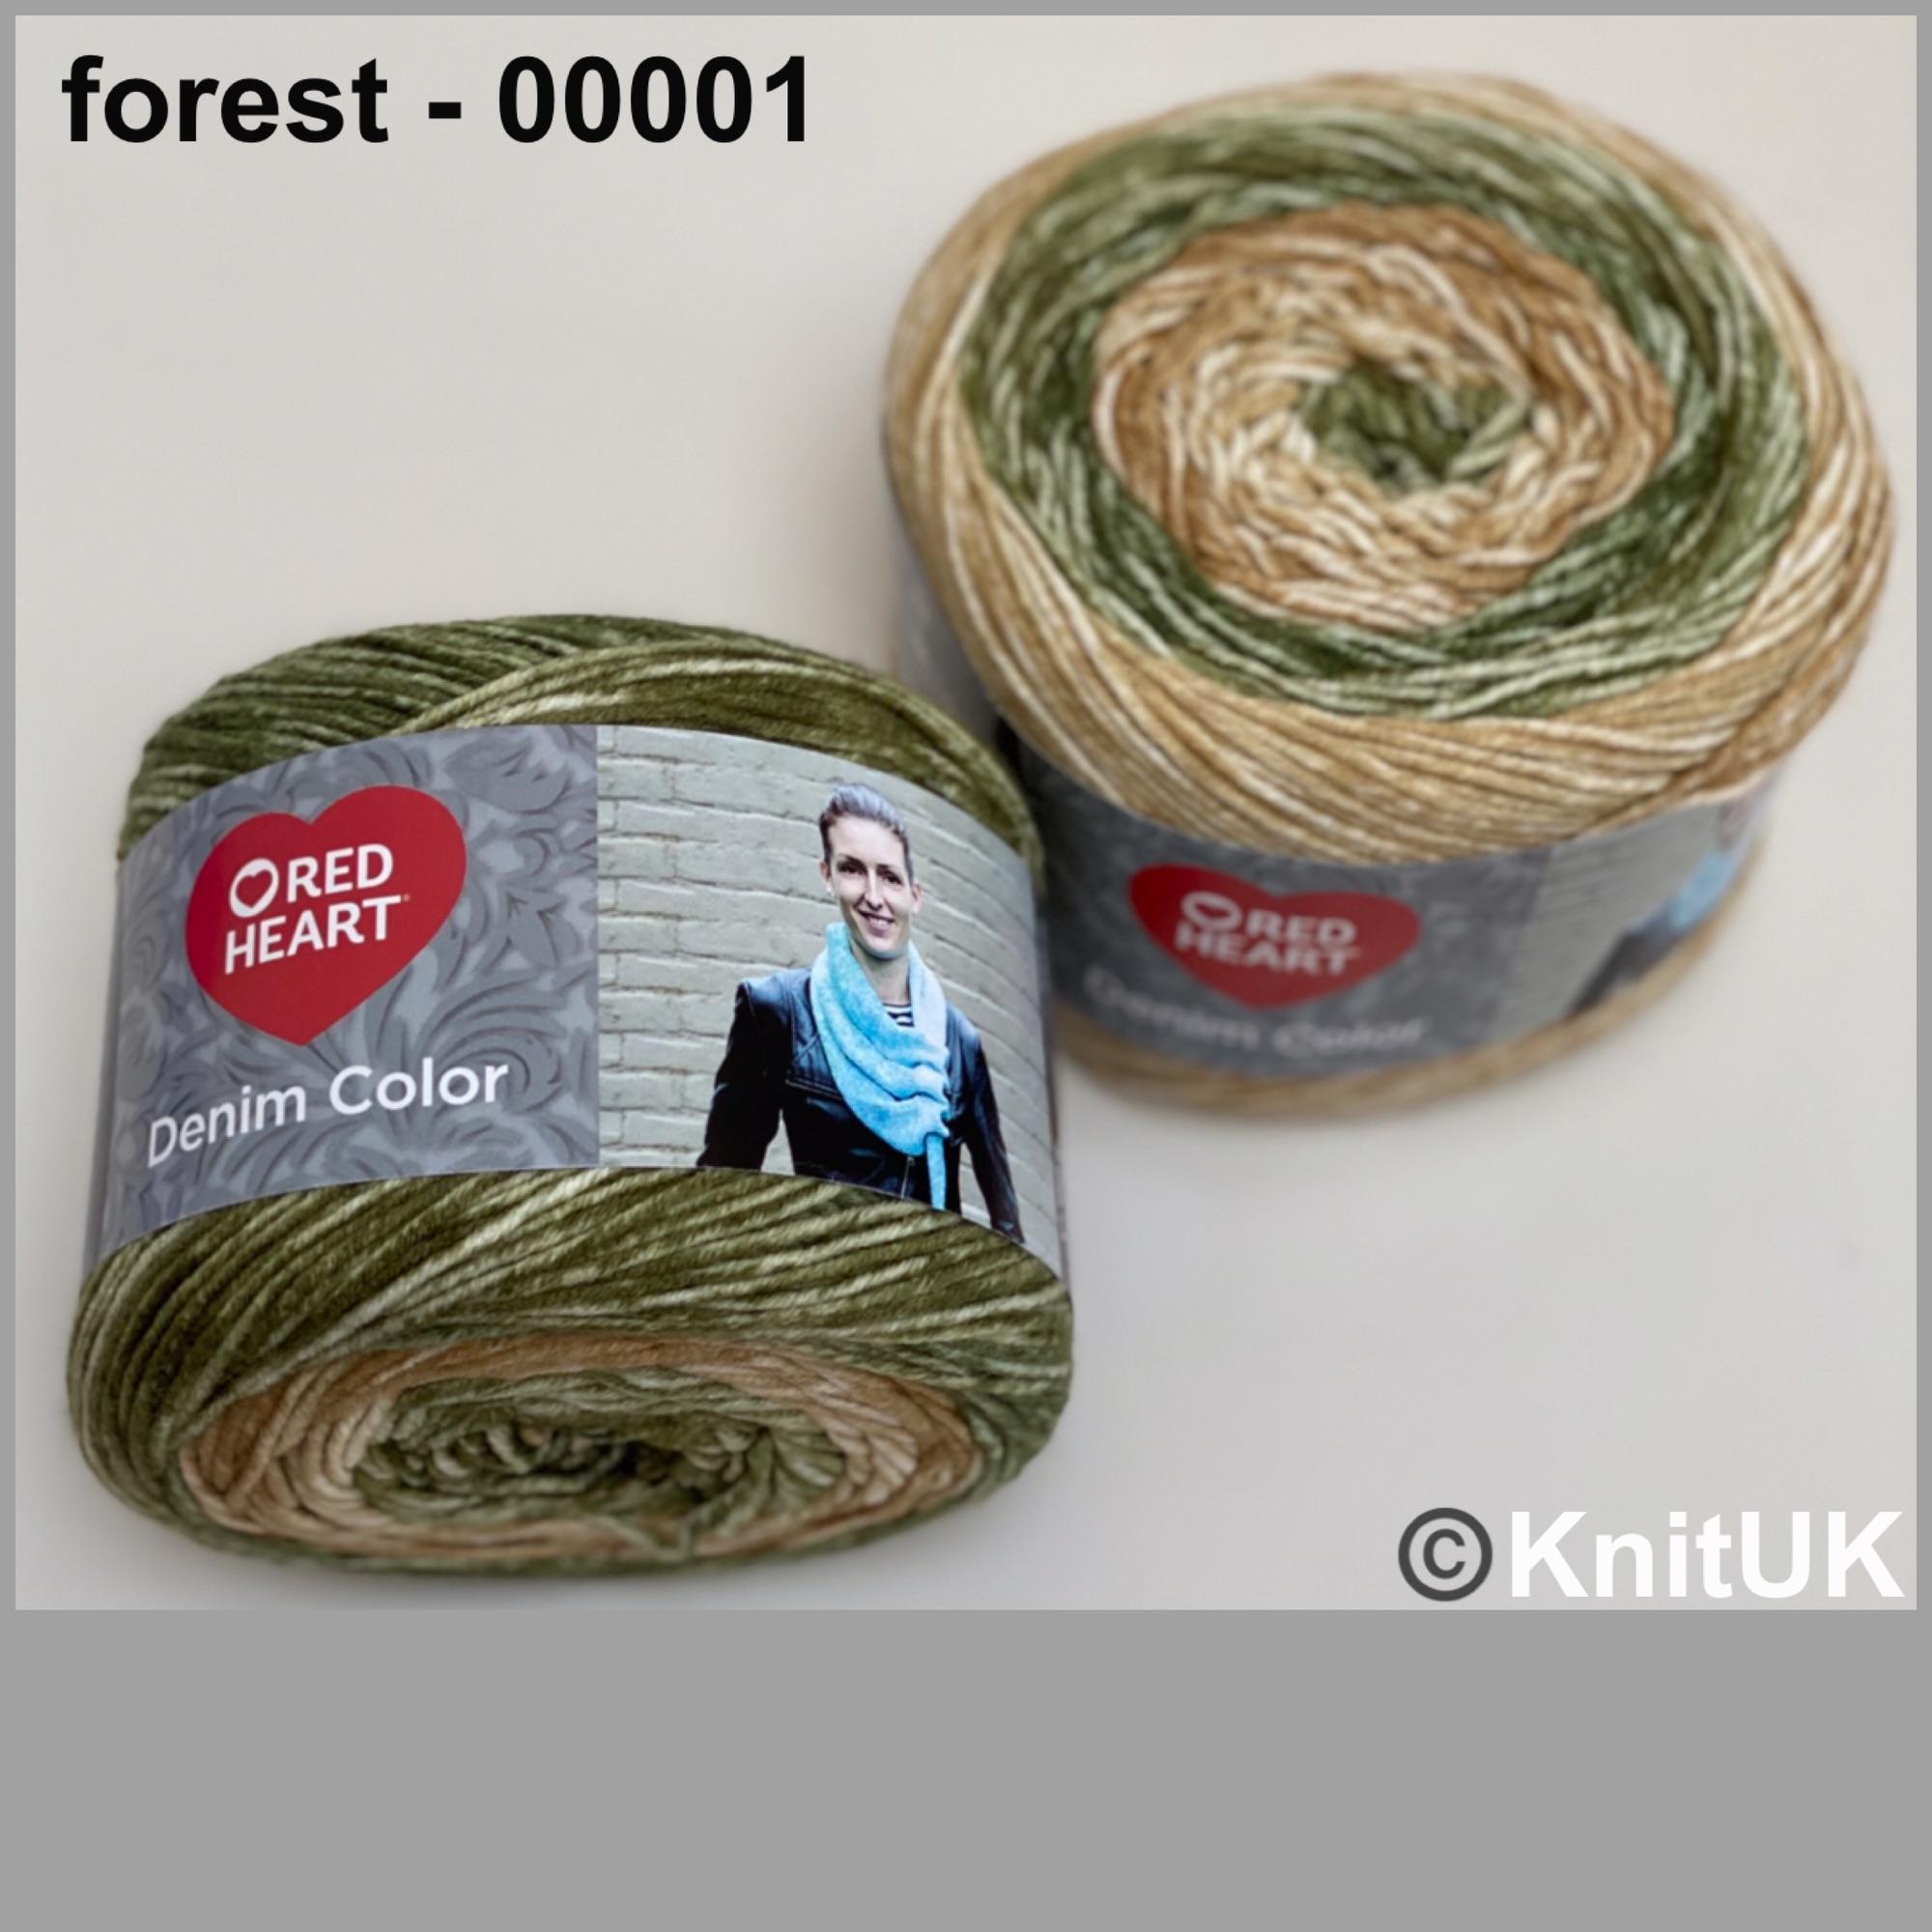 Red heart denim color forest colour acrylic yarn loom knitting crochet